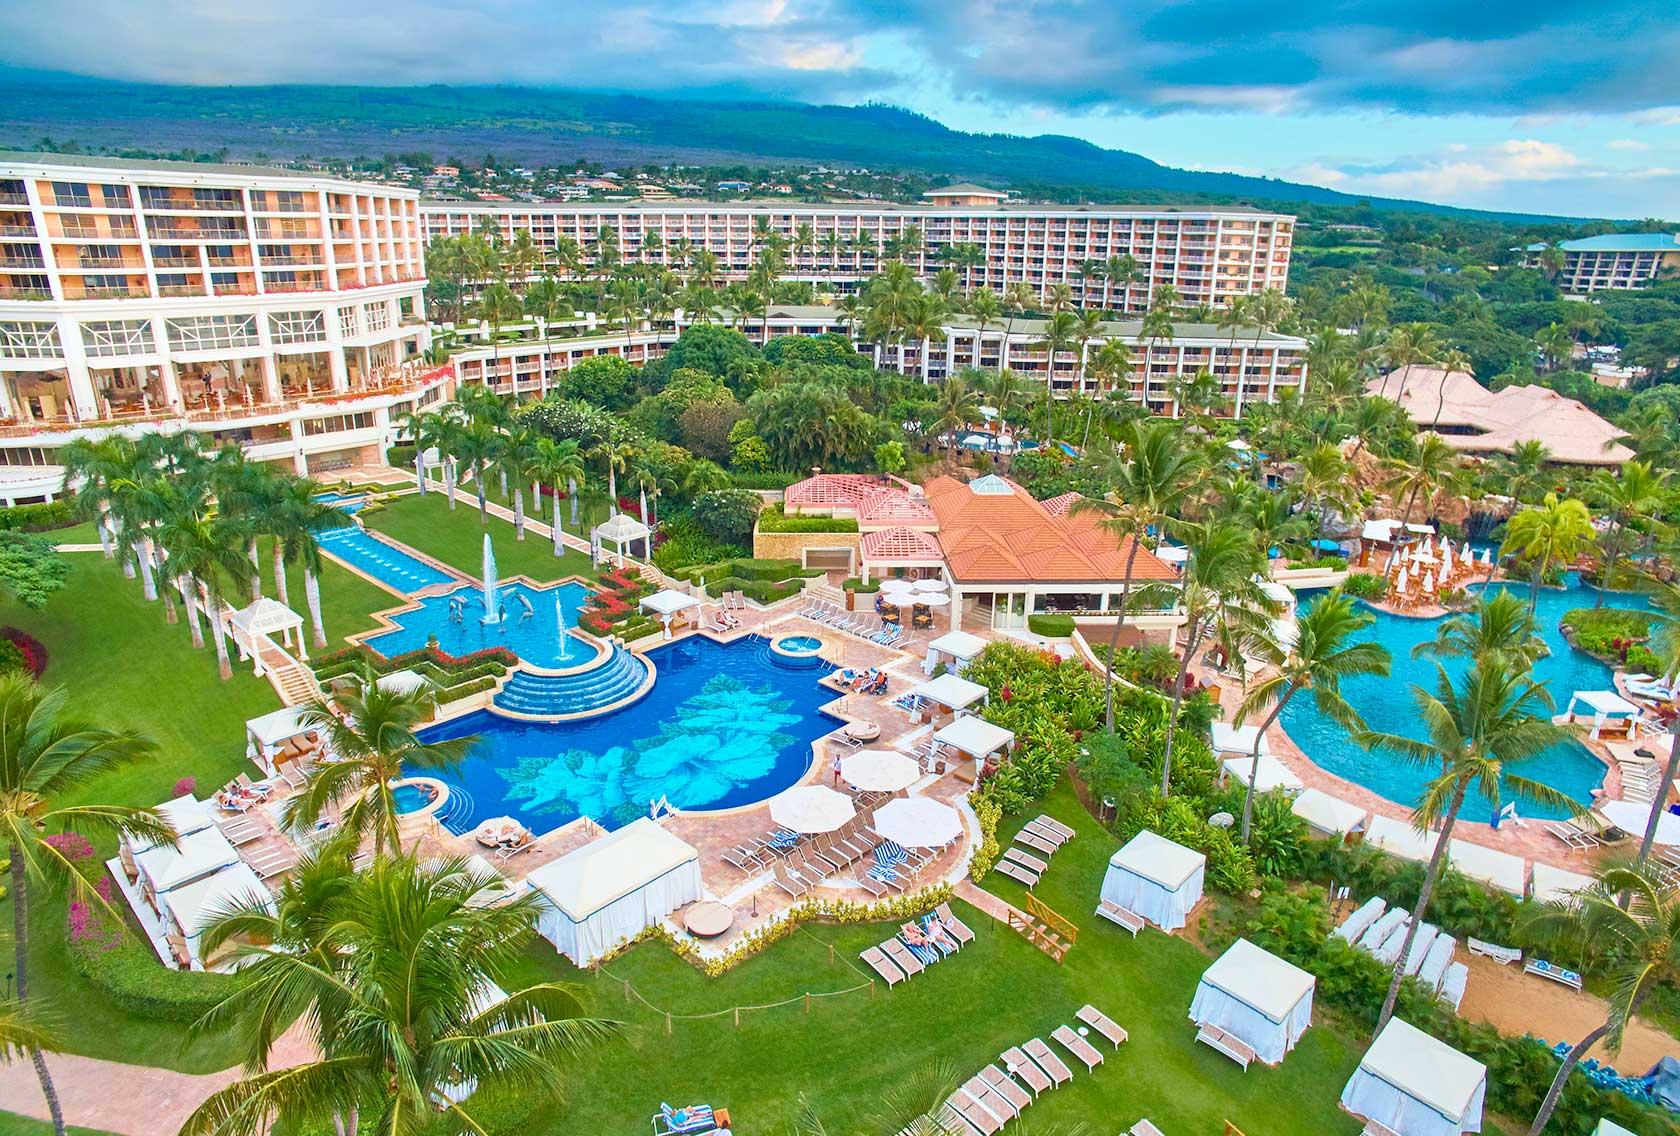 Honua Kai Floor Plan Grand Wailea Has The Most Insane Hotel Pool Ever Man Of Many